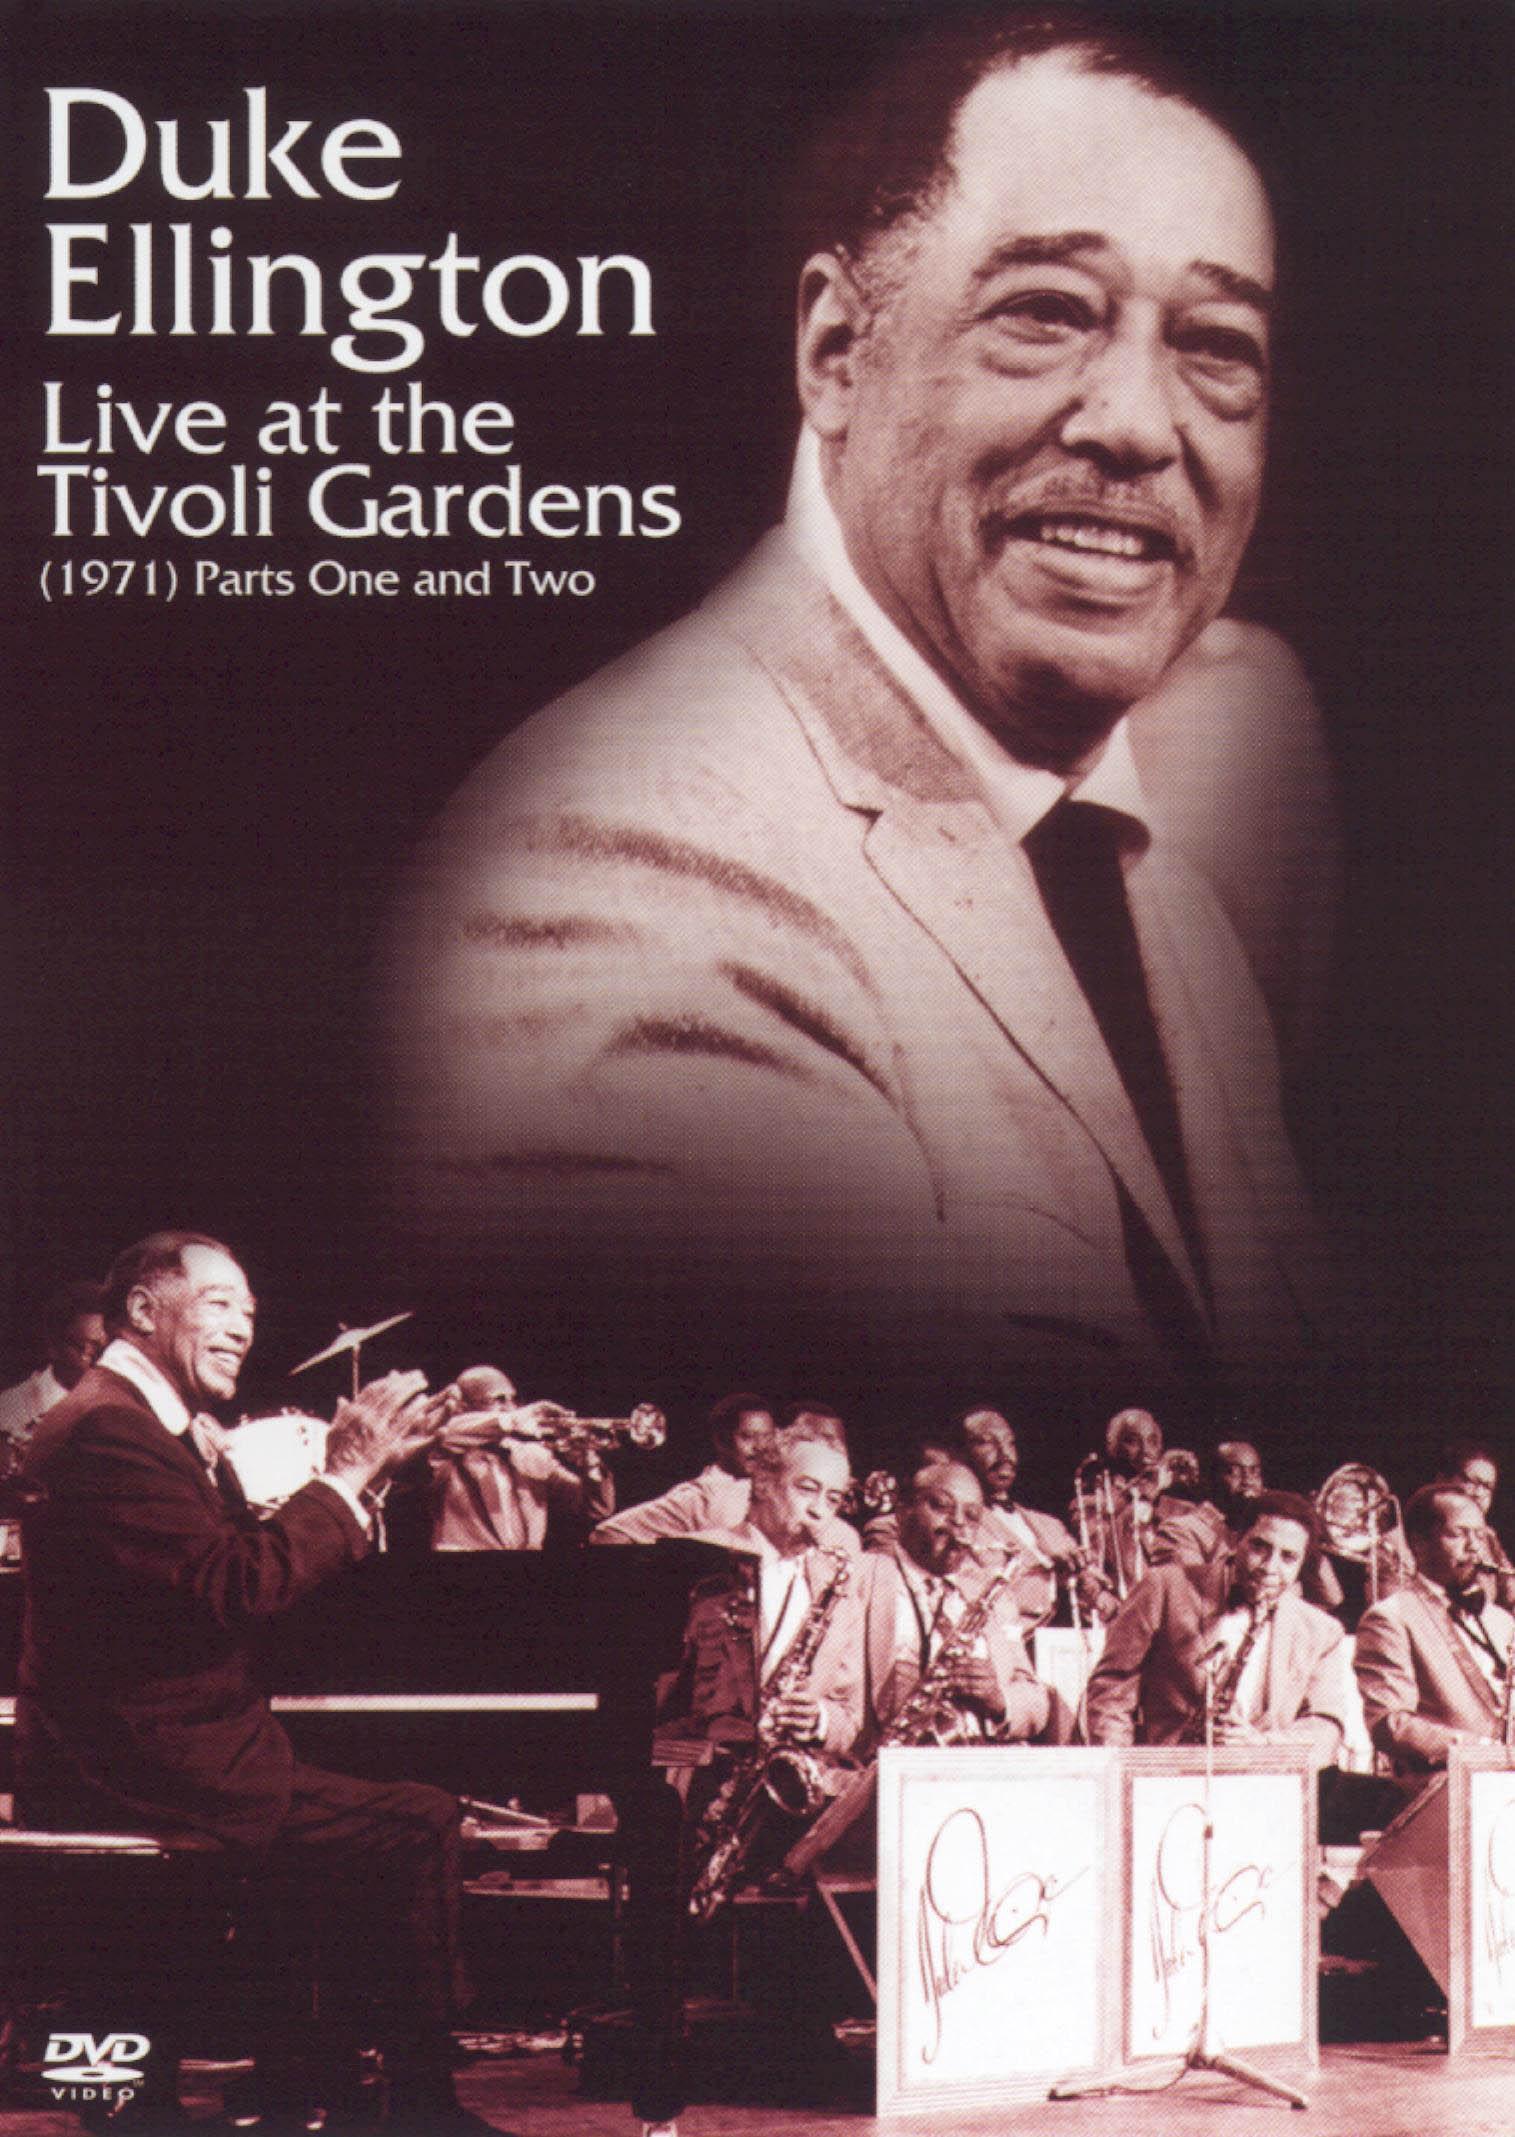 Duke Ellington: Live at the Tivoli Gardens (1971), Parts 1 and 2